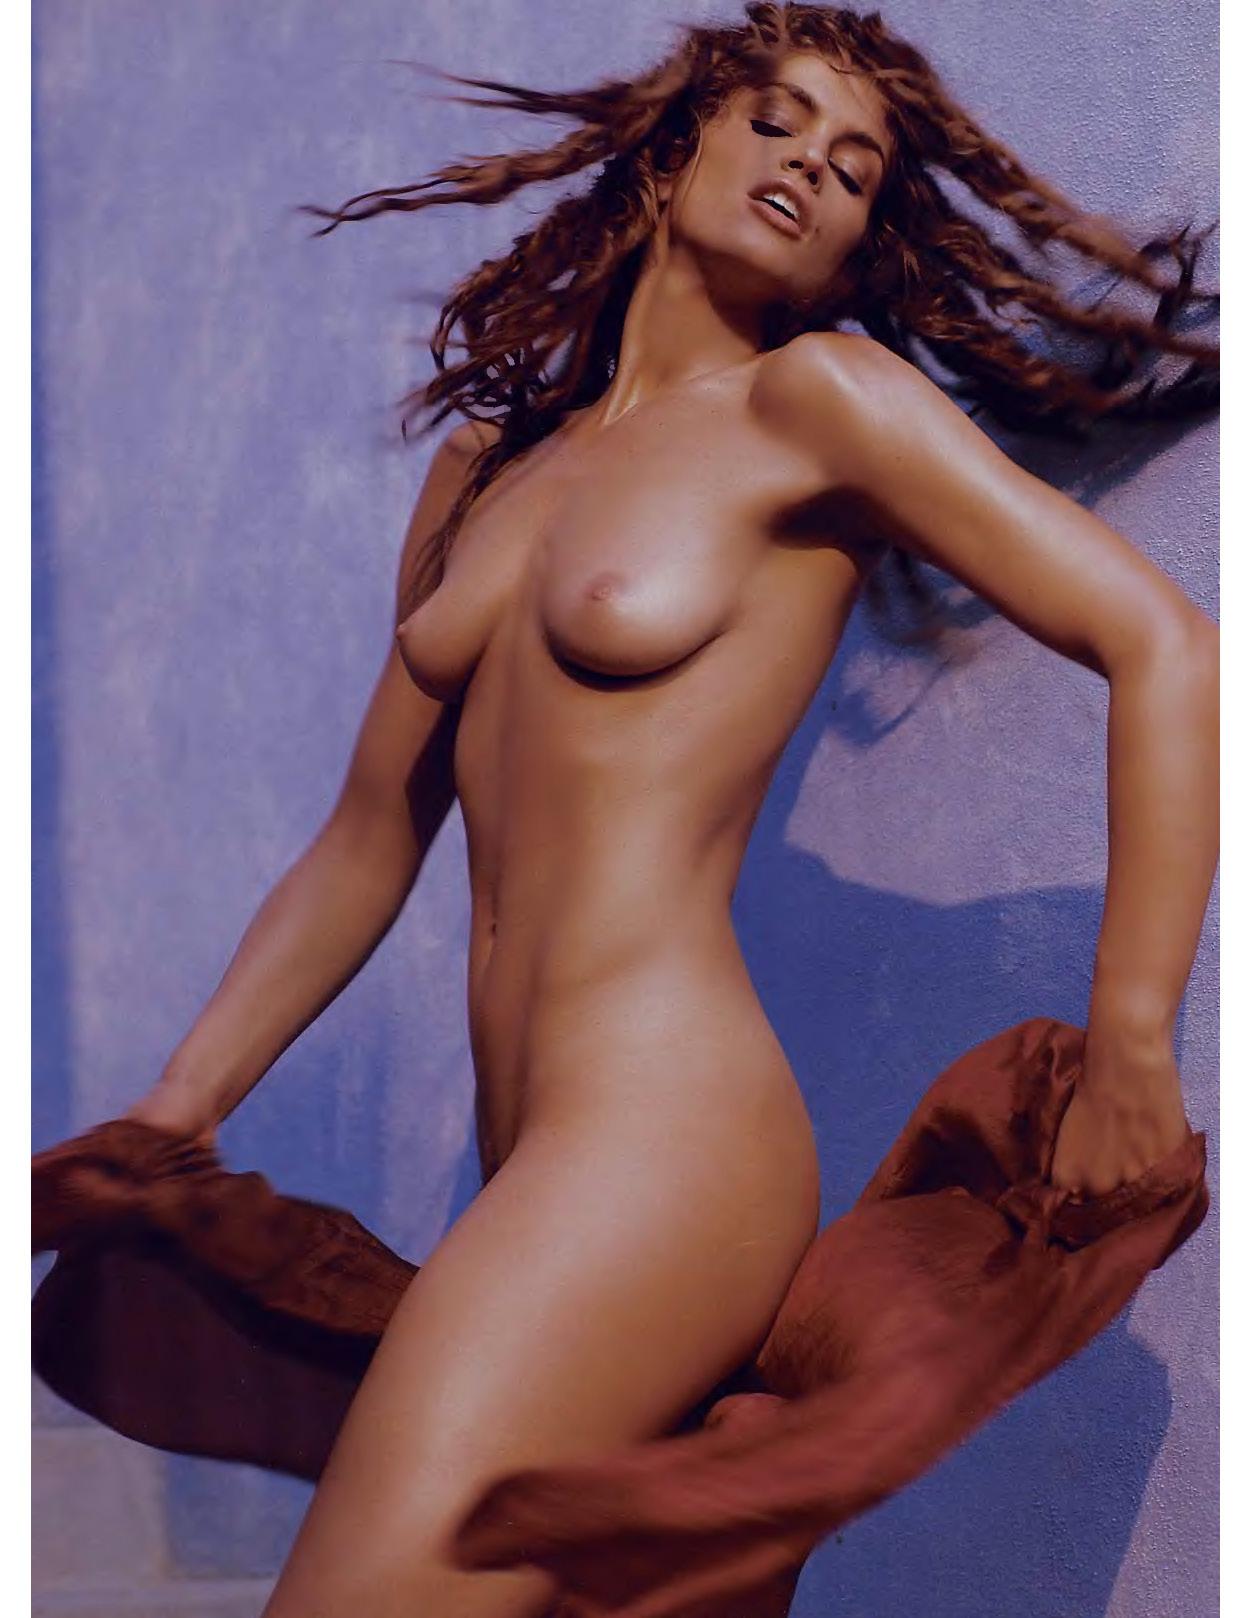 Cindy Crawford nue pour Playboy en 1998 6